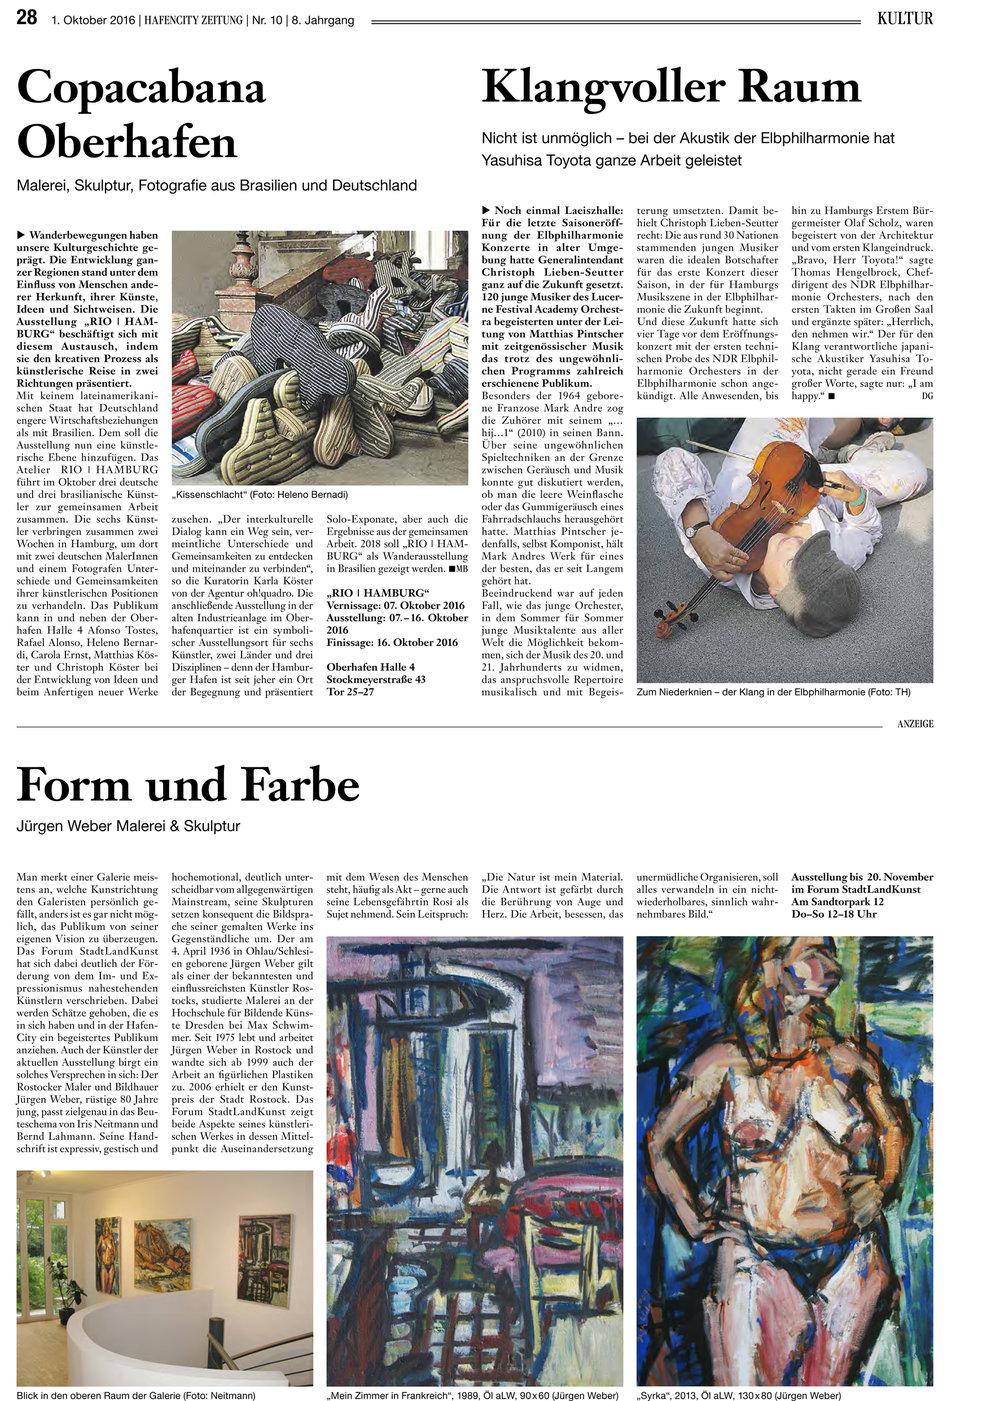 Hafencity Zeitung N0. 10 / 2016